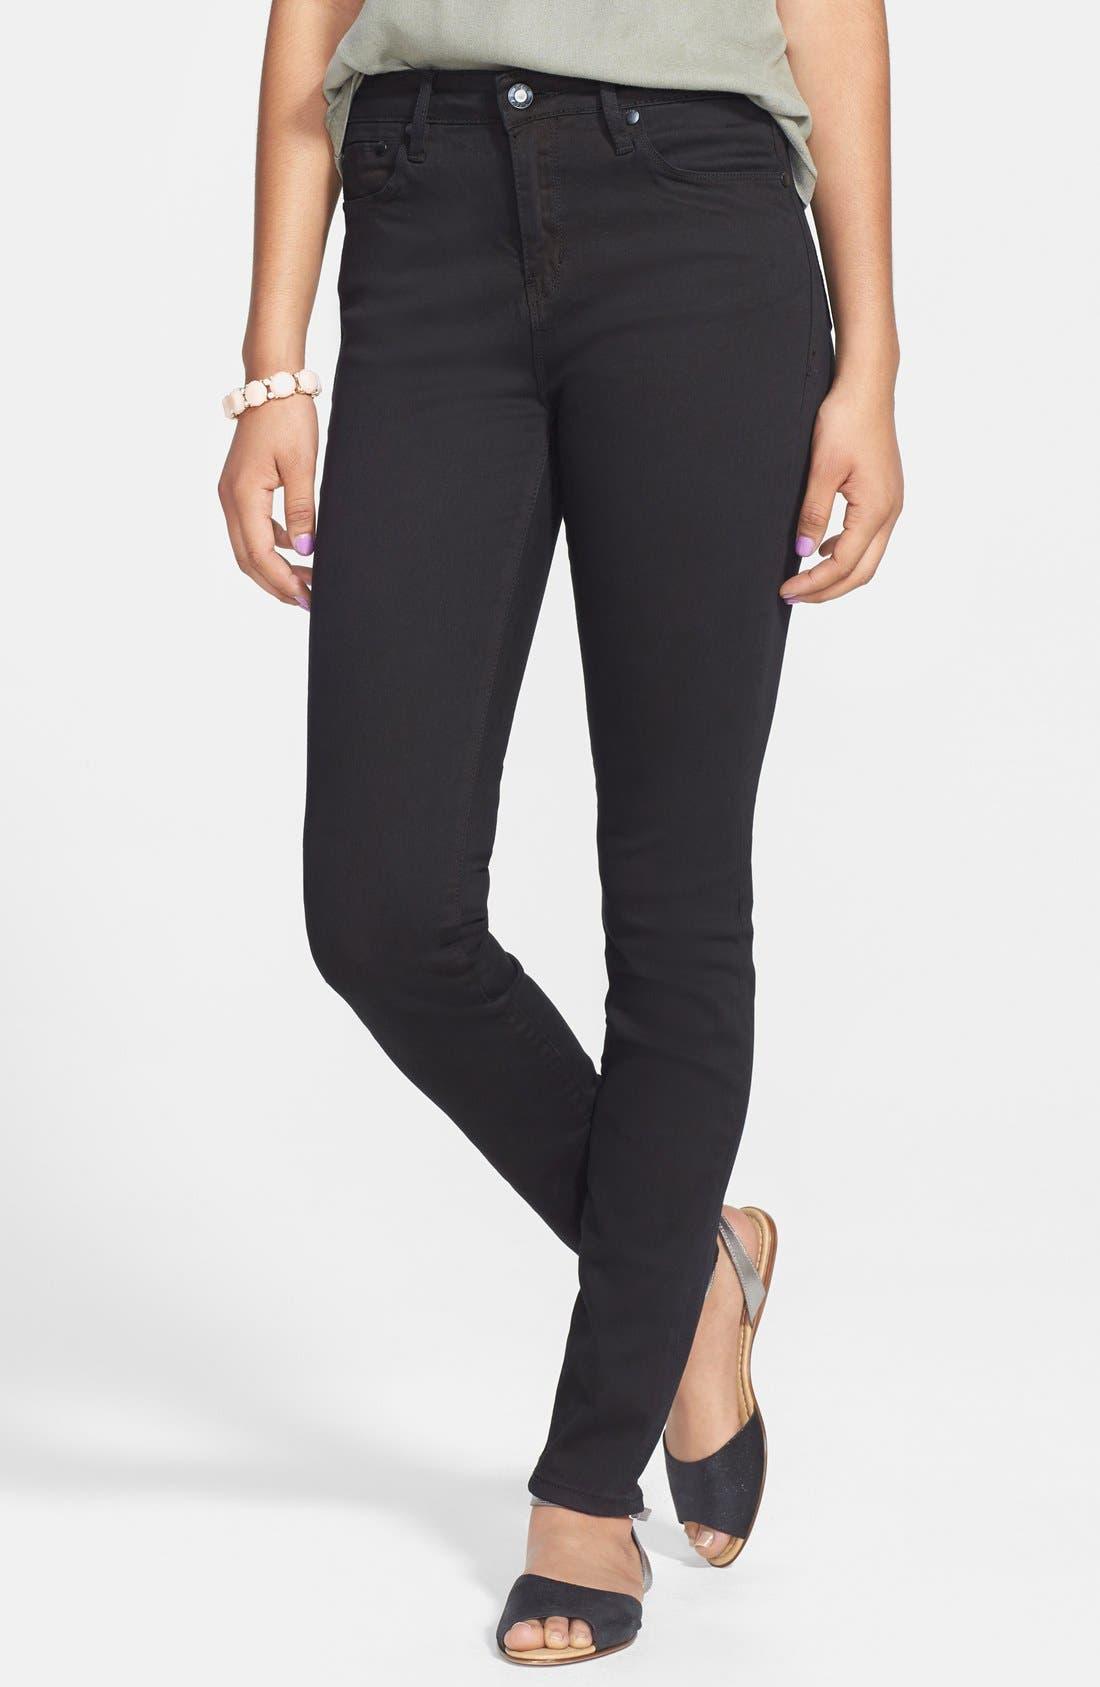 Main Image - THIS CITY High Waist Skinny Jeans (Black) (Juniors)